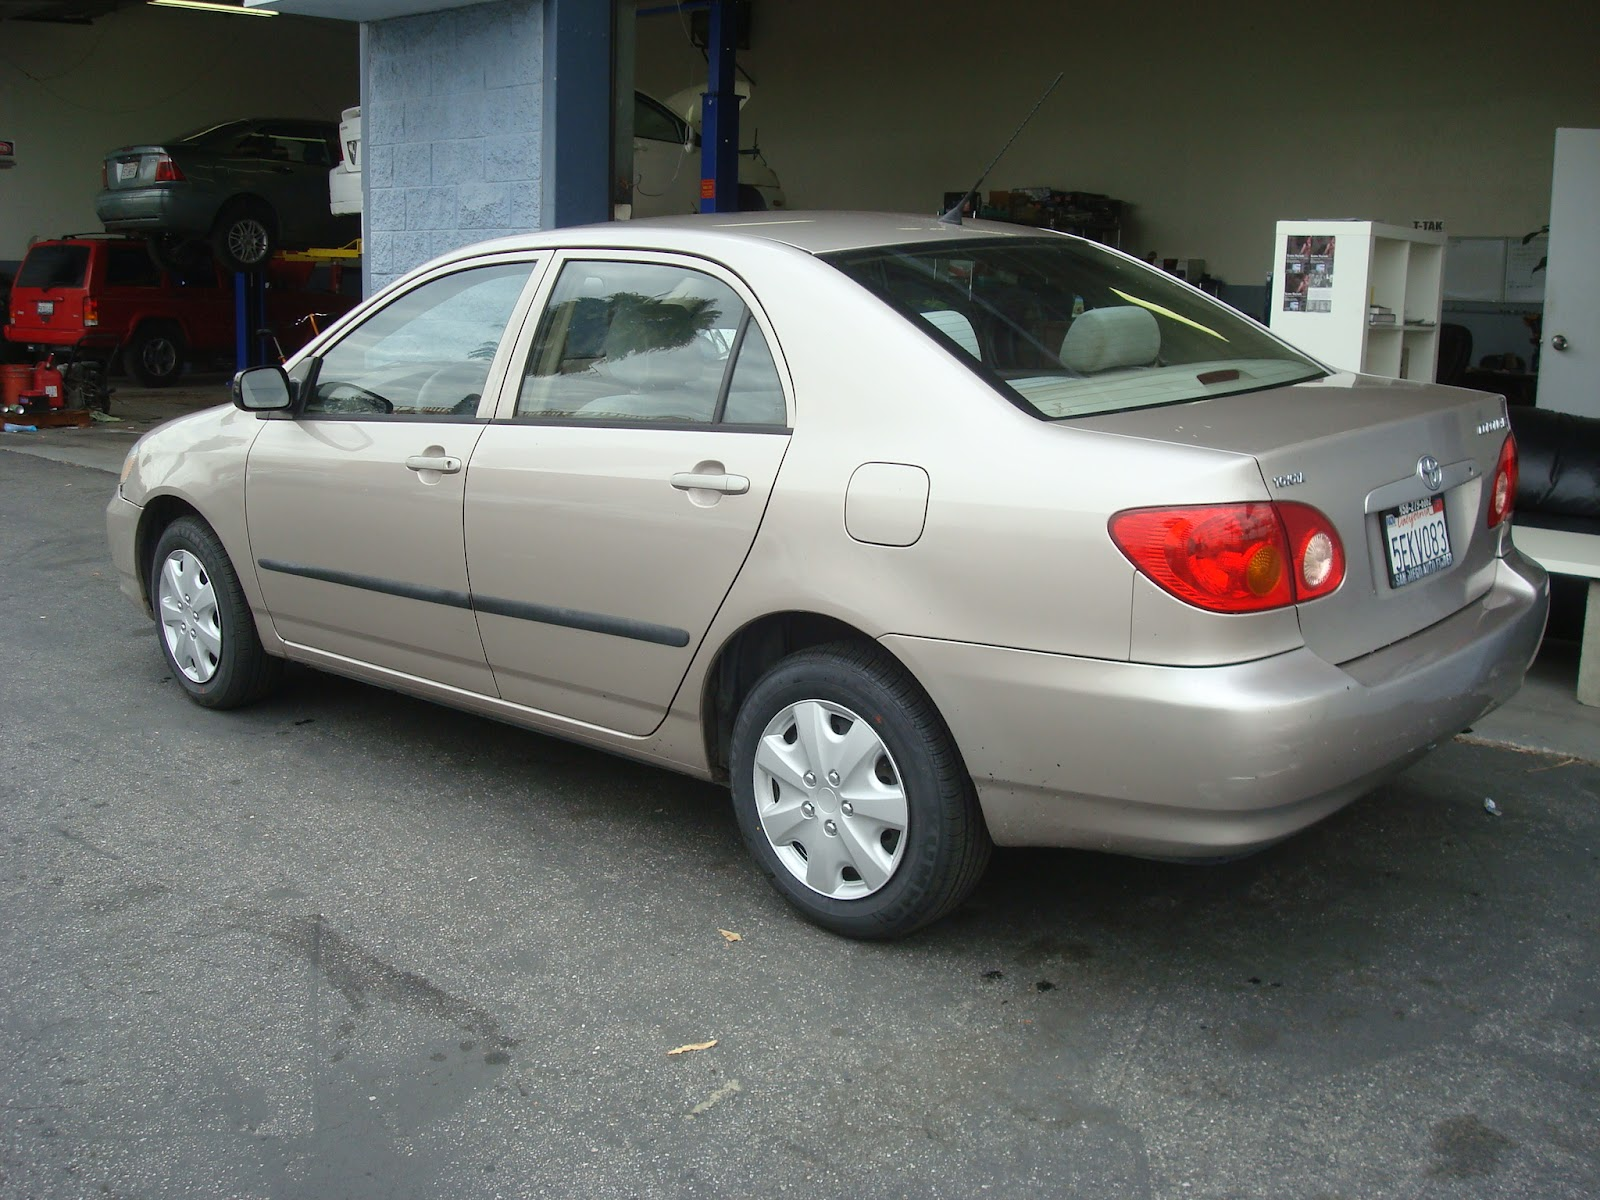 2003 Toyota Corolla #11 Toyota Corolla #11